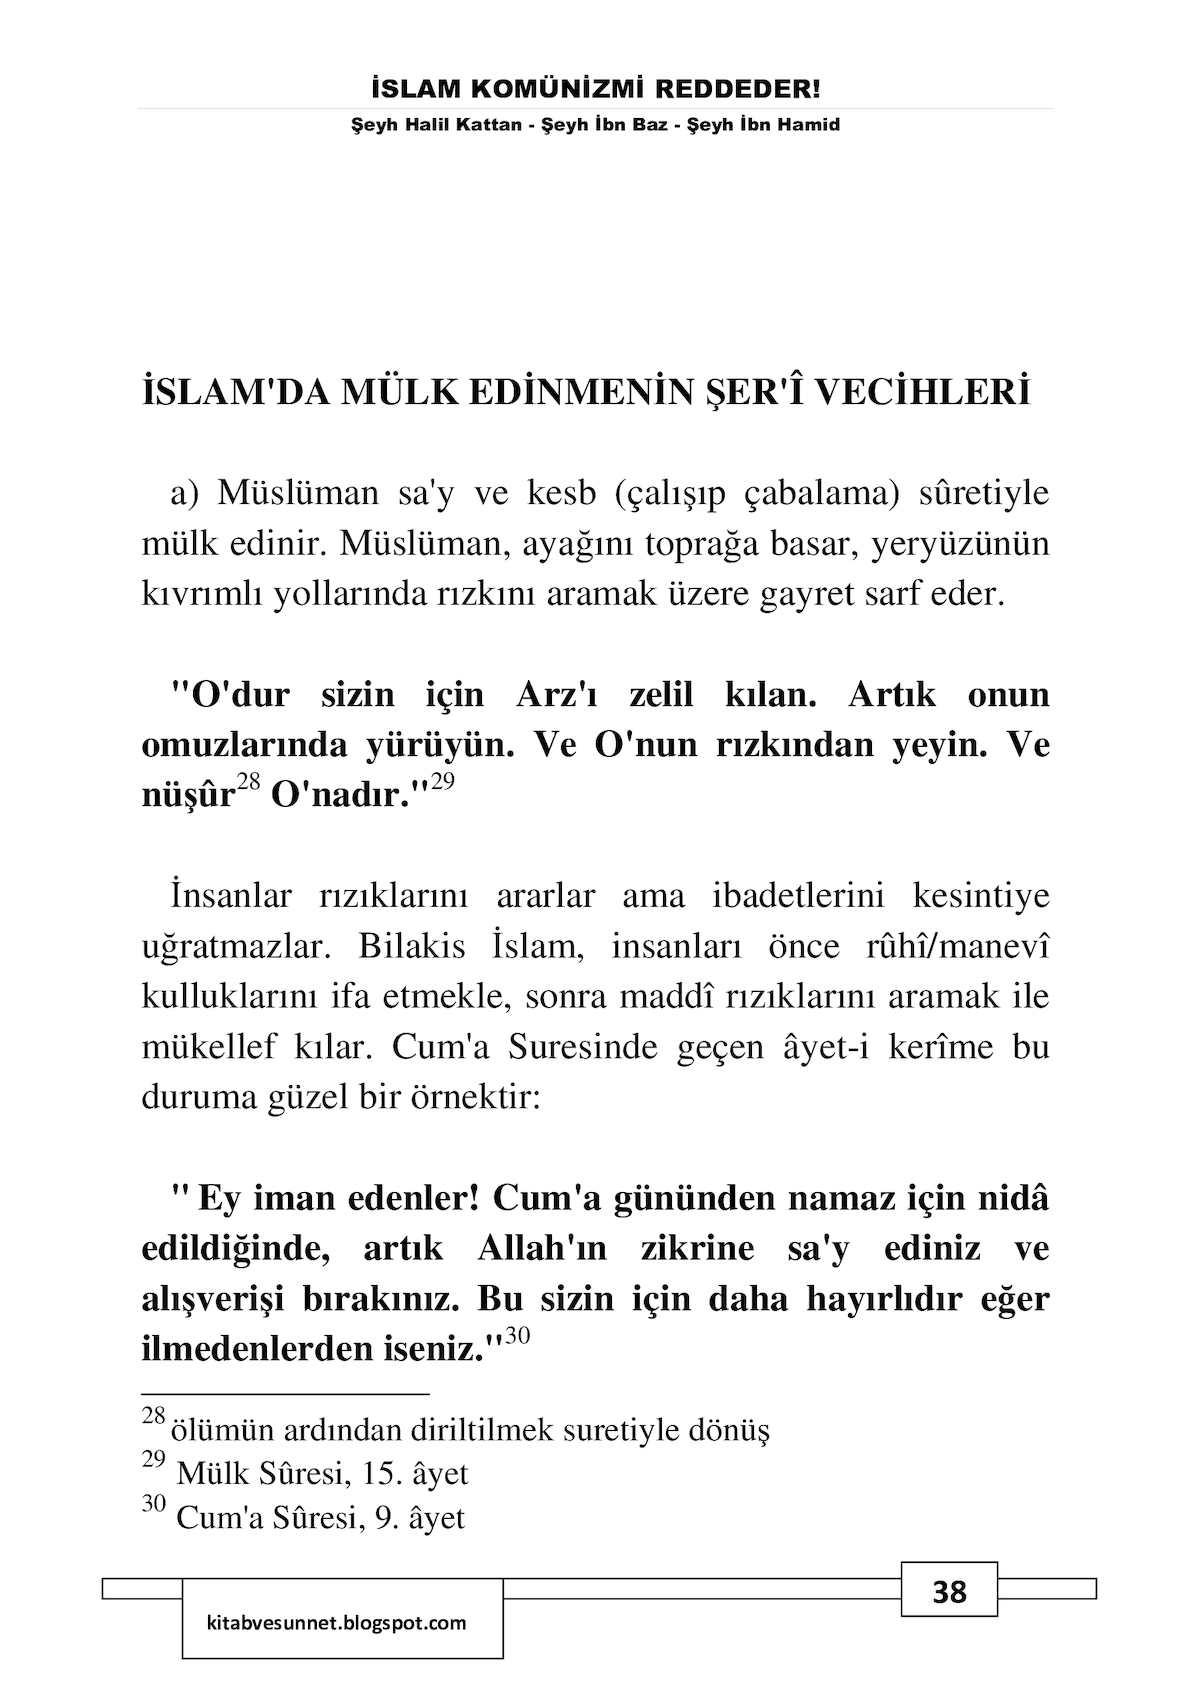 Islam Komunizmi Reddeder Calameo Downloader